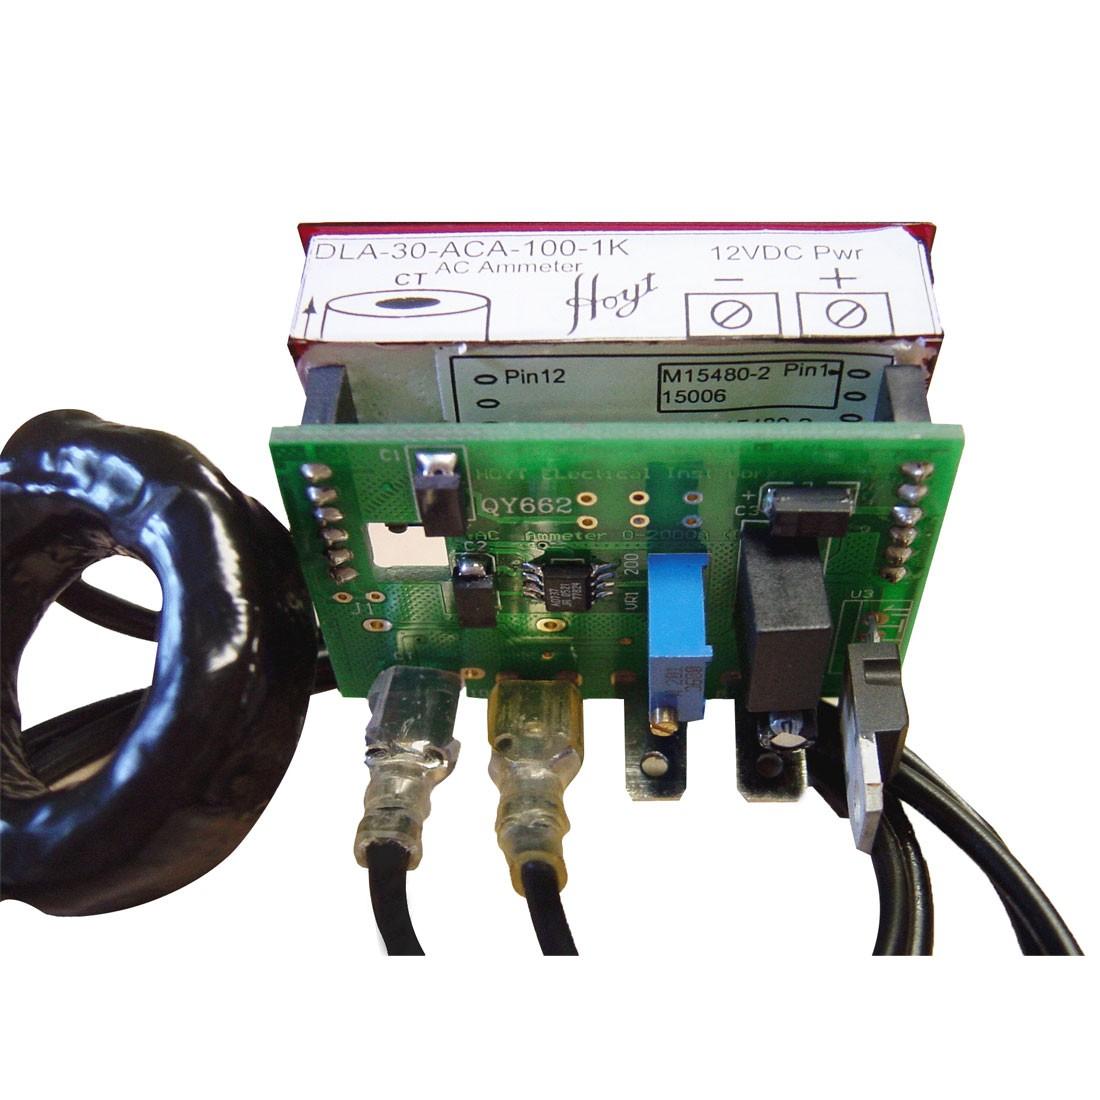 DLA-30-ACA-100-1K LED AC - Front View